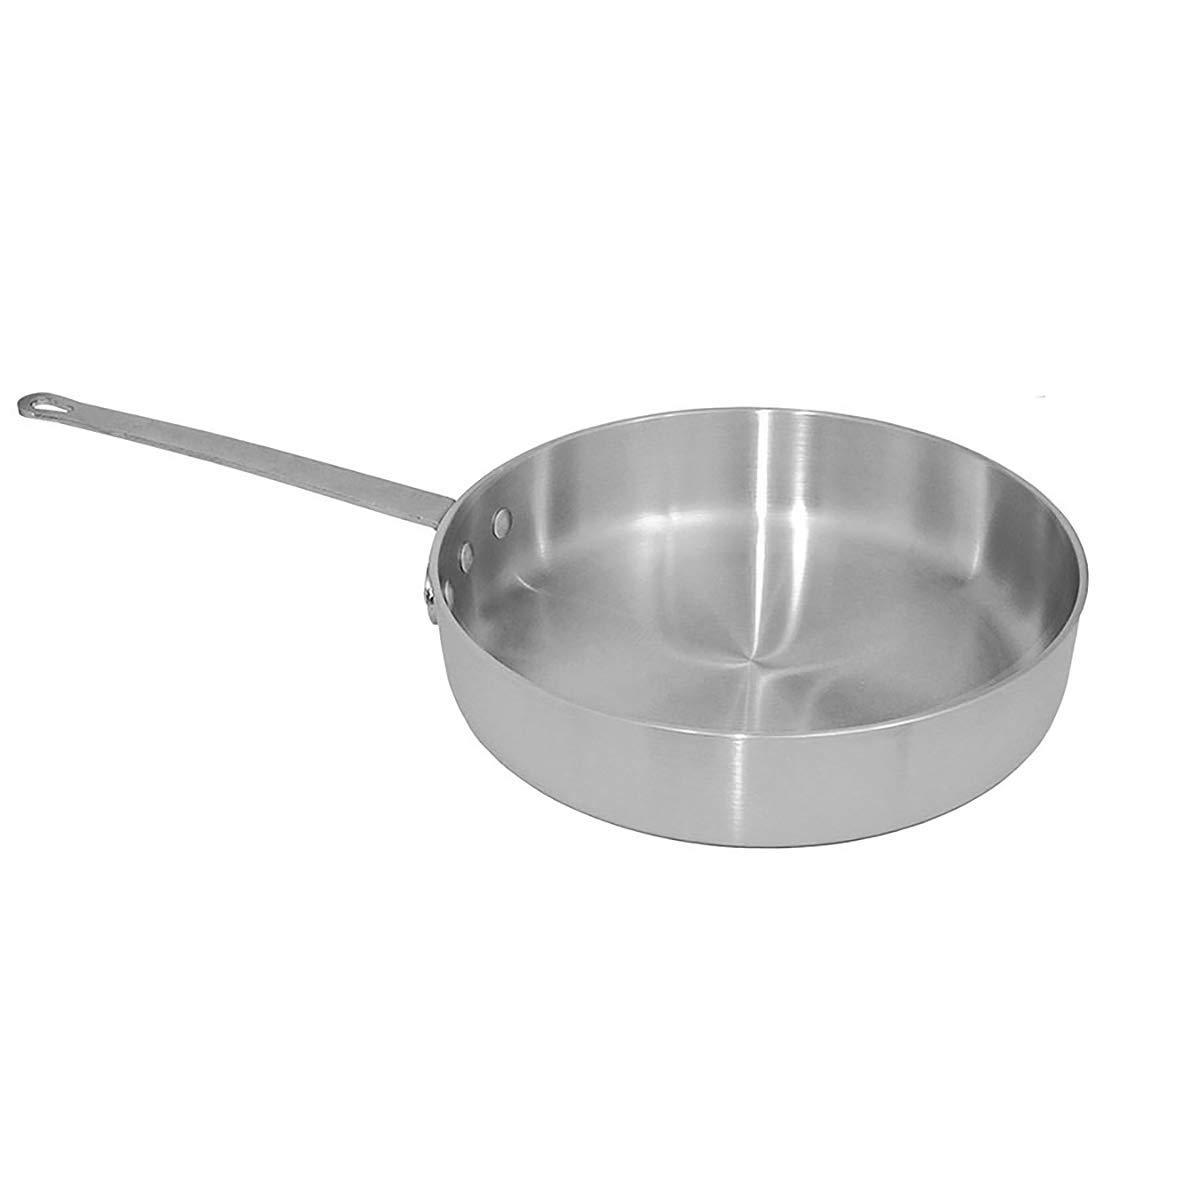 "Update International (ASAU-5) 12"" Aluminum Saute Pan"